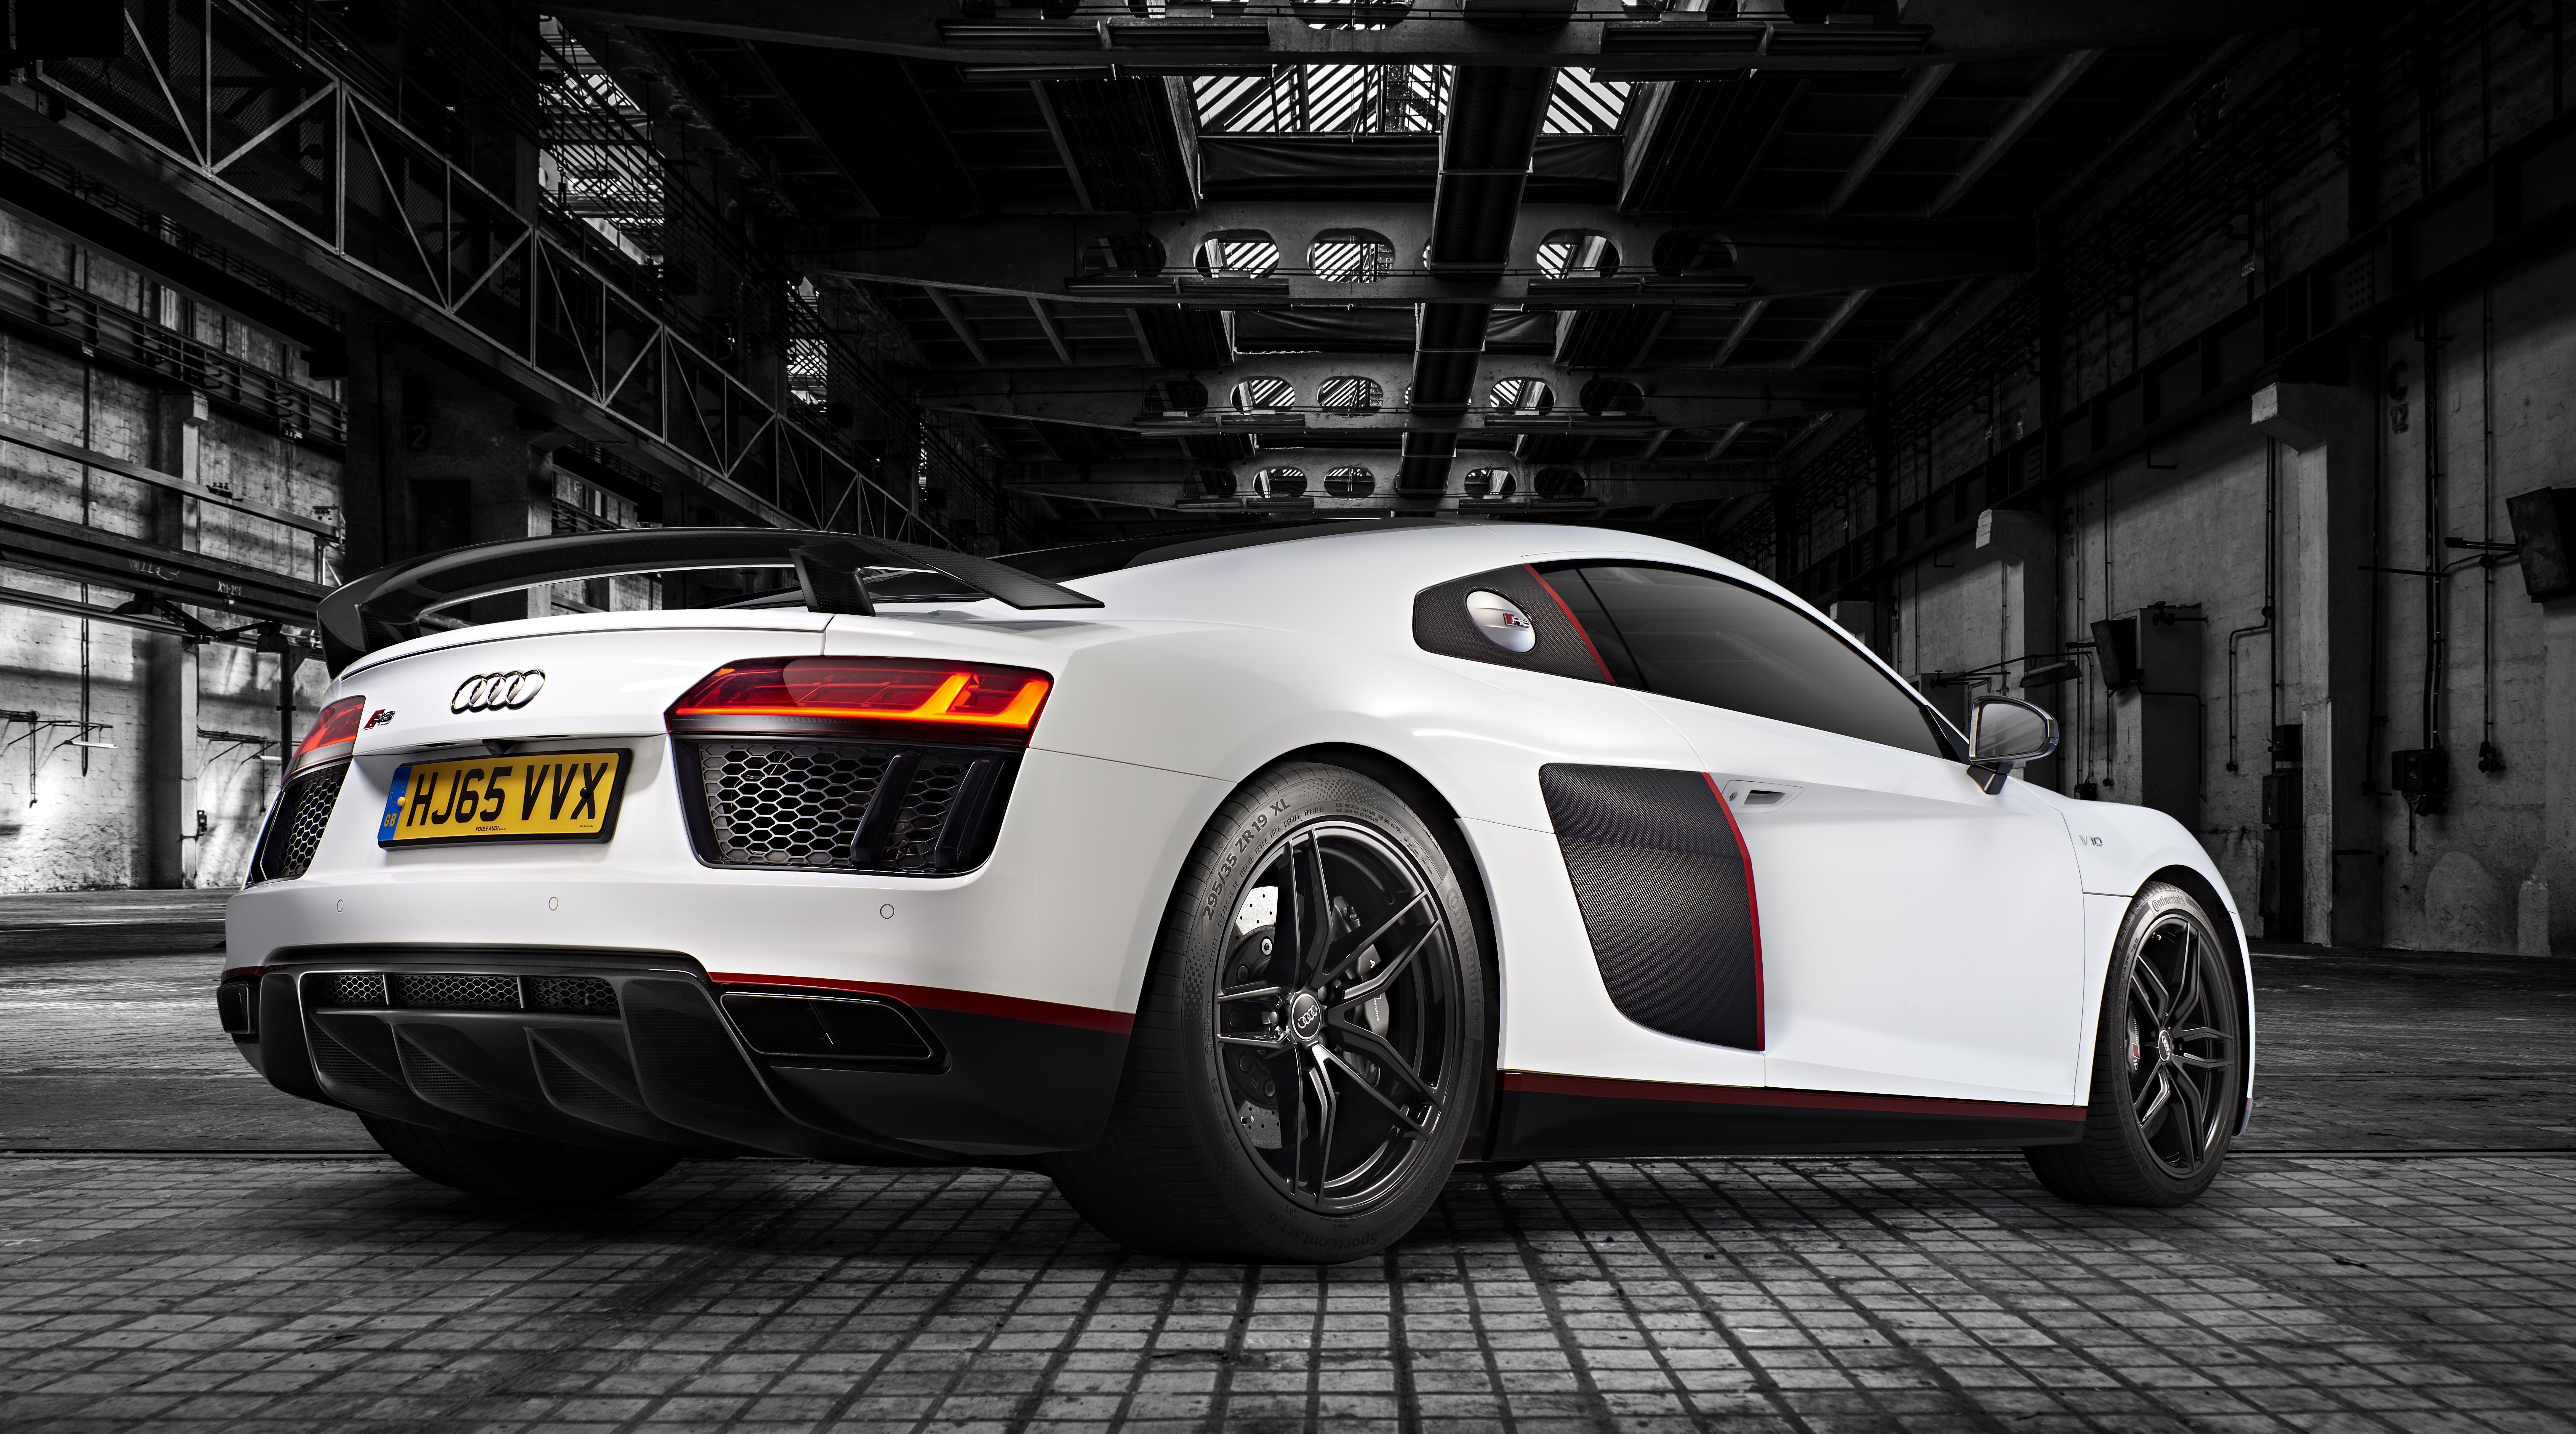 Superbe Cars · The Beautiful Audi R8